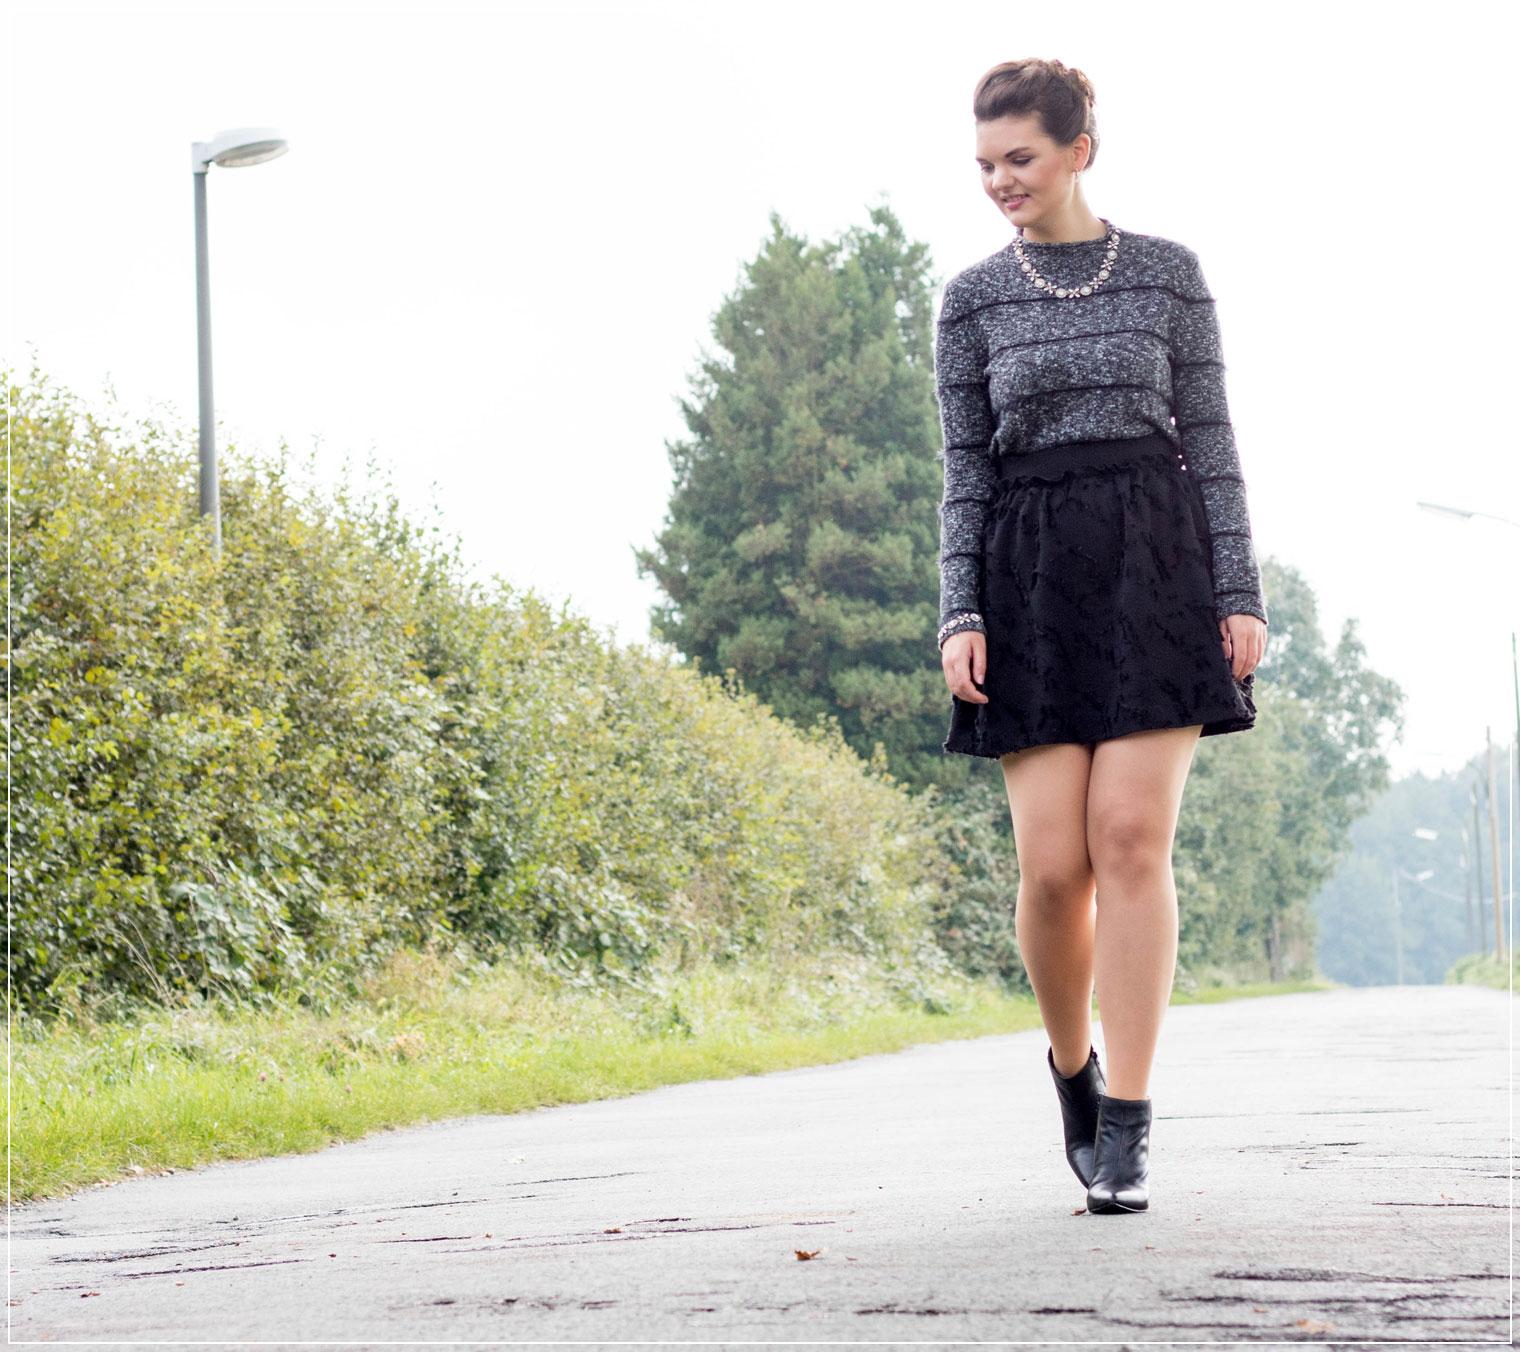 Season Wechsel, Shoppingtipps, Rabatte, Shopping Inspirationen, Herbstmode, Herbstoutfit, Autumnstyle, Fall 2018, Modetrends, Blogger, Fashionblogger, Ruhrgebiet